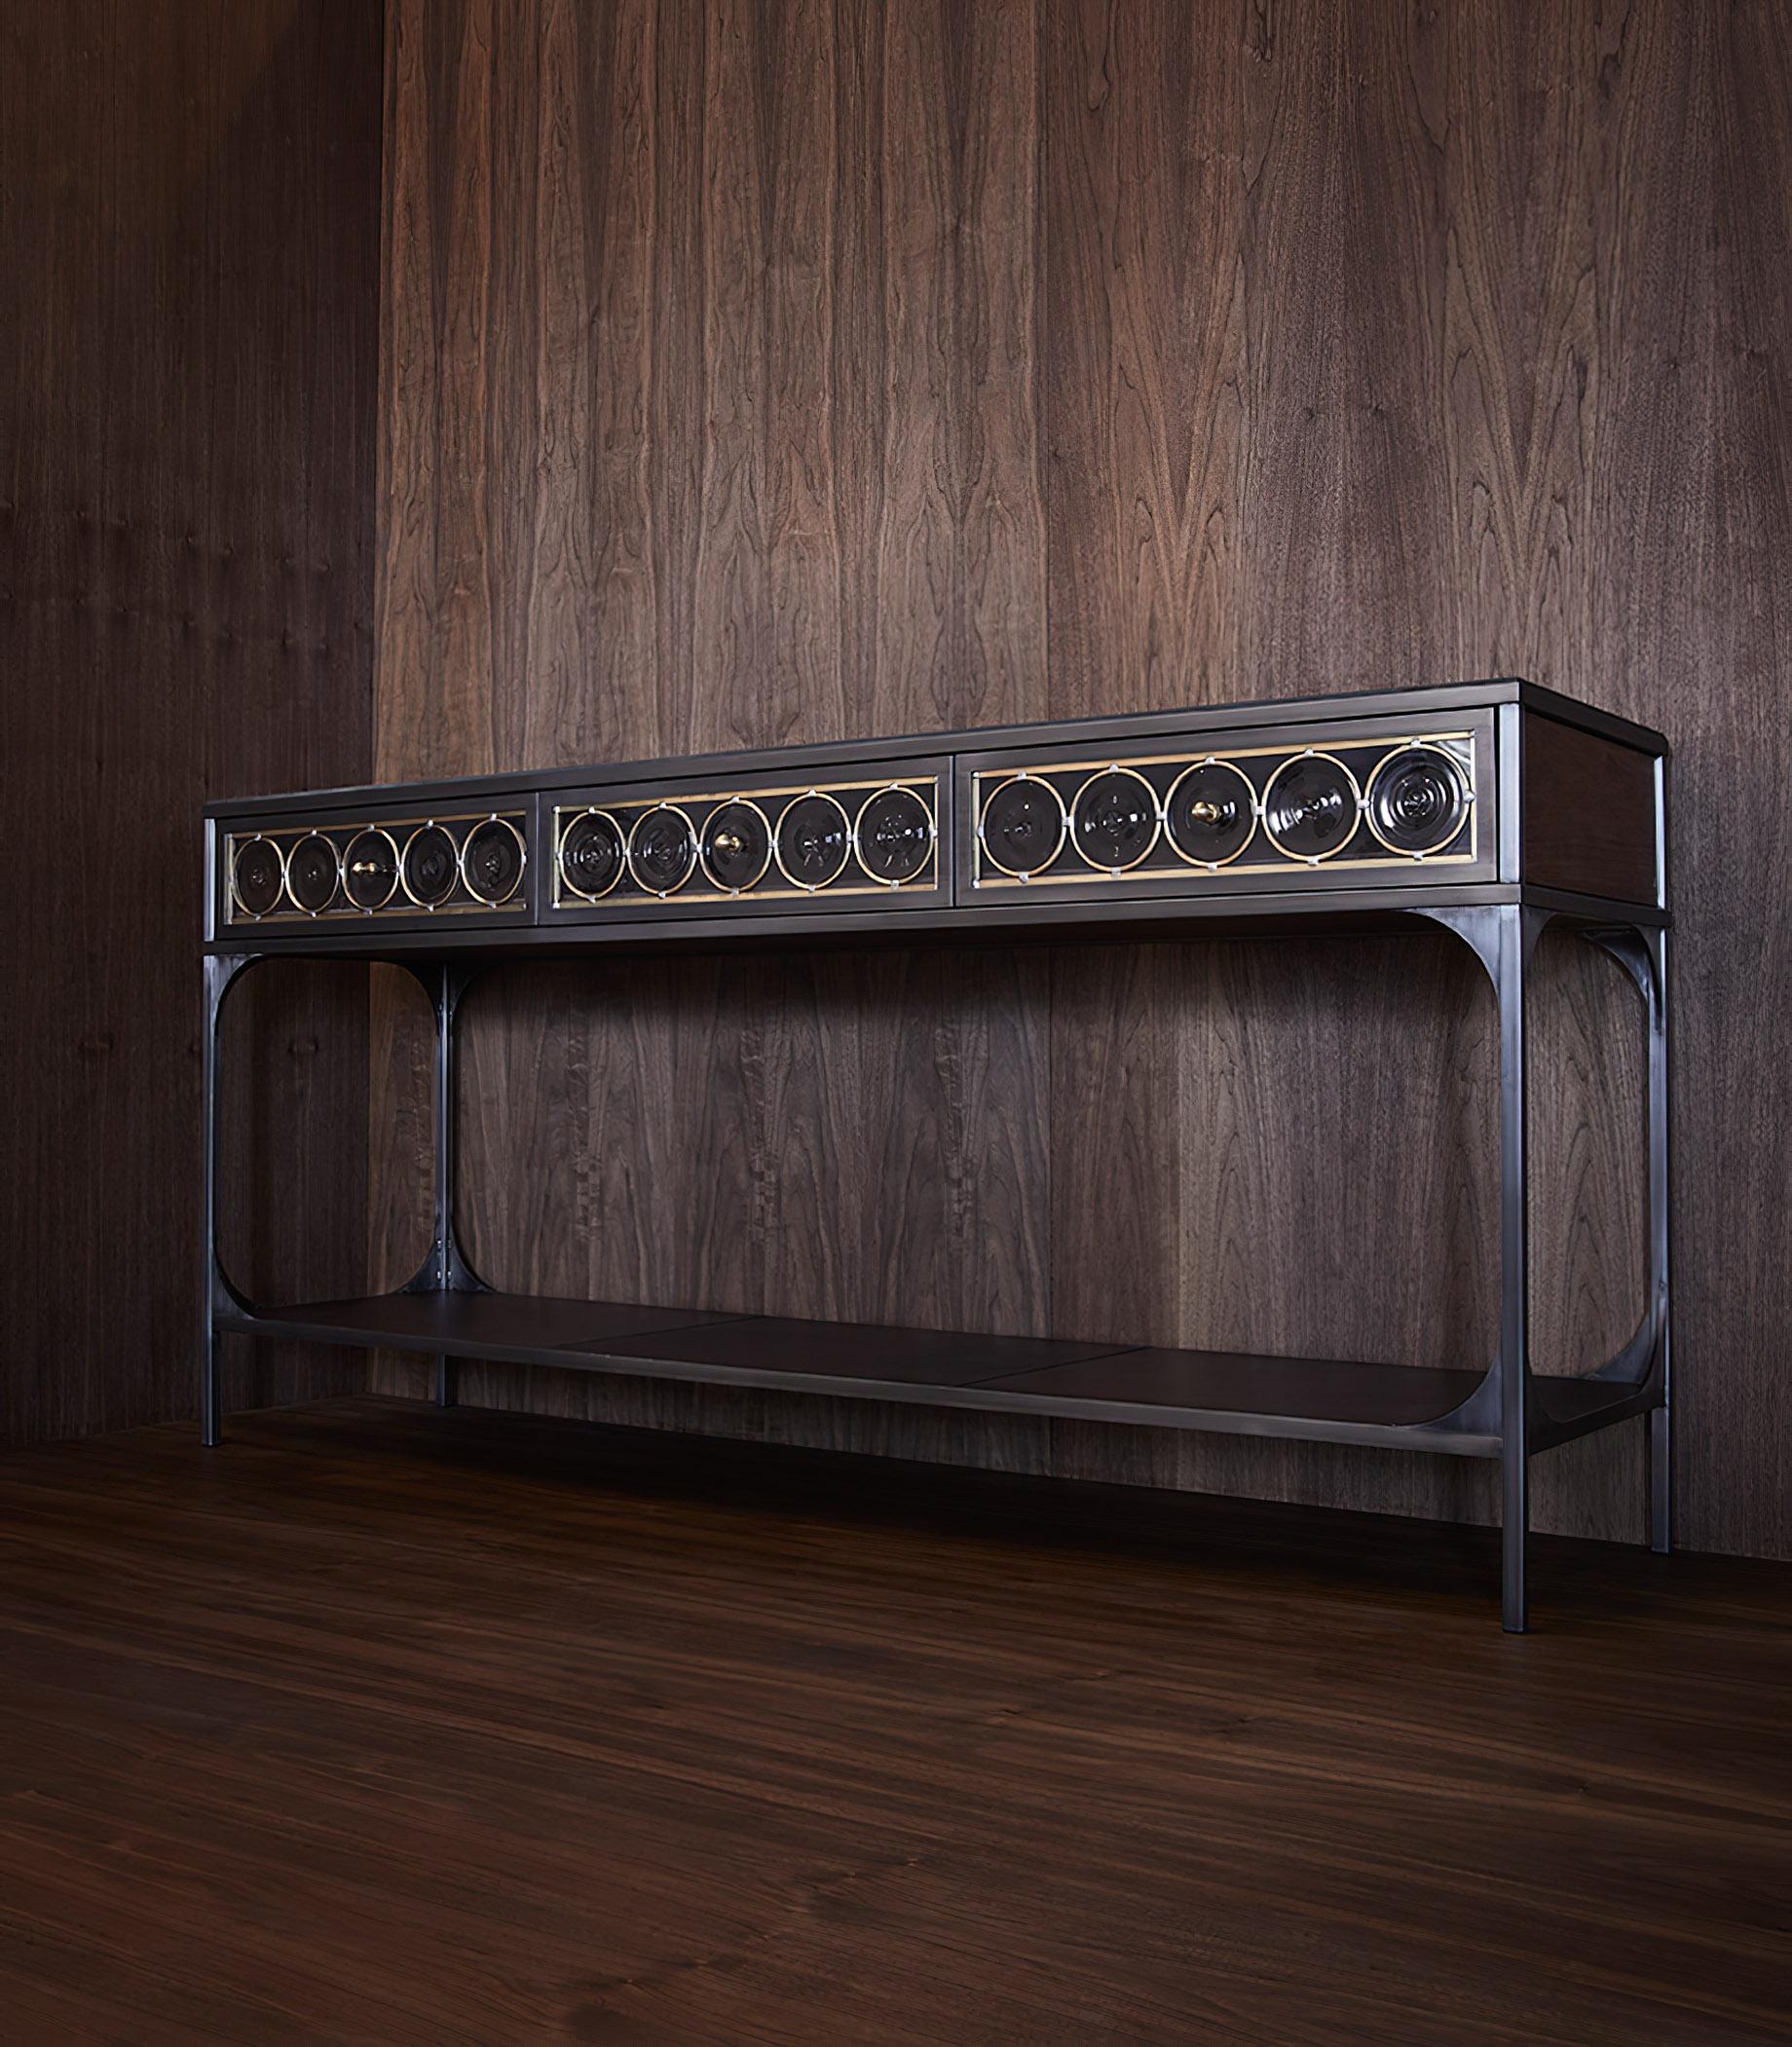 RONDELLE Craftmark Luxury Furniture Collection – John Pomp – Rondelle Console